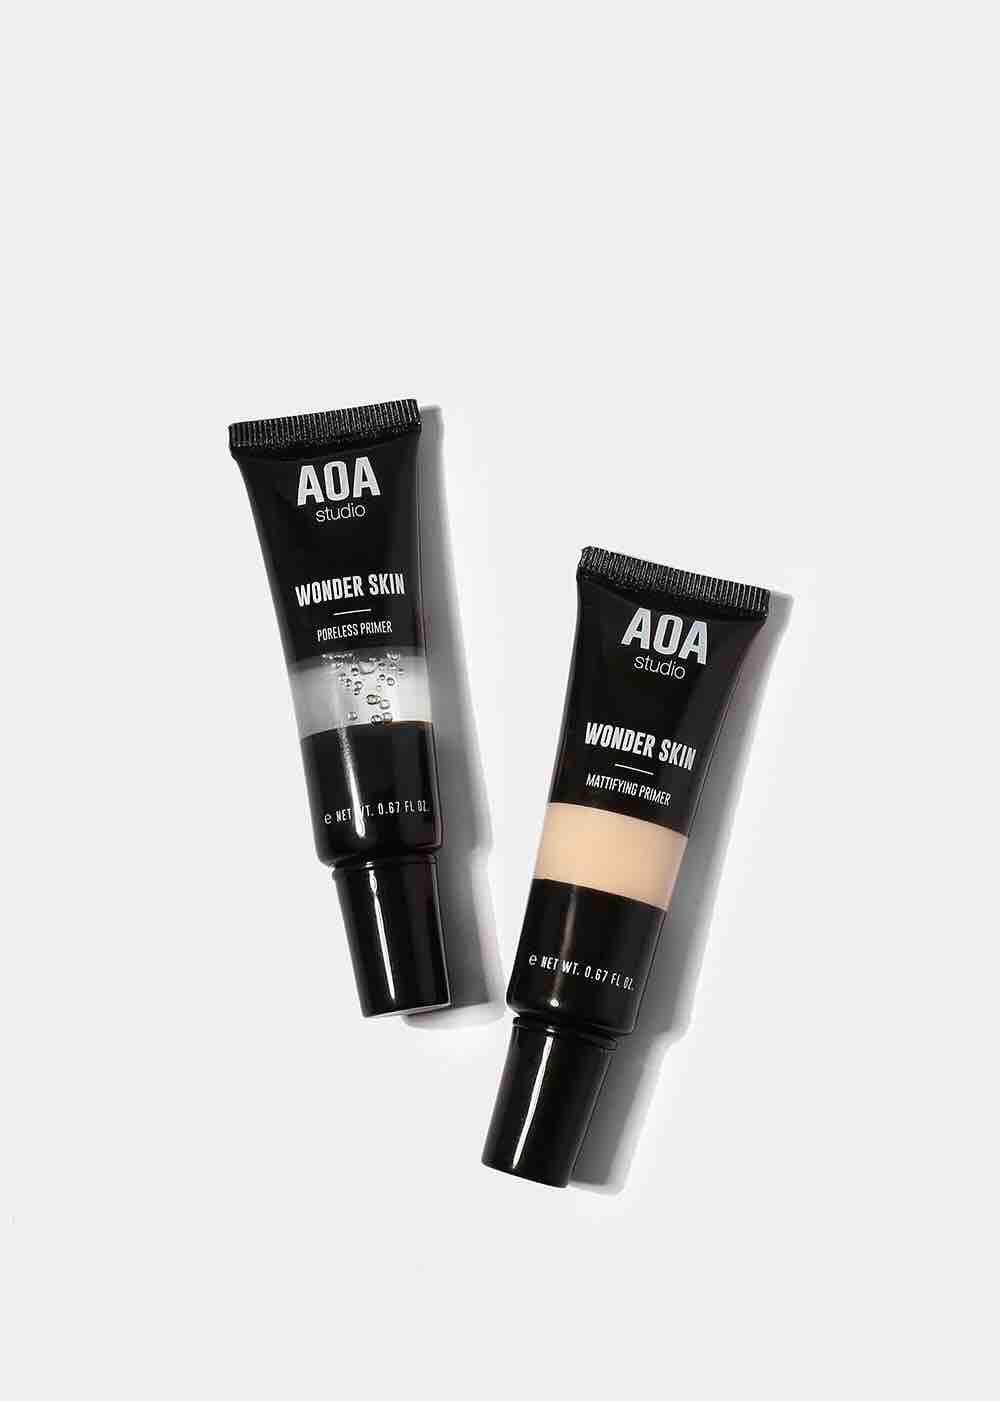 AOA Face Primer Philippines